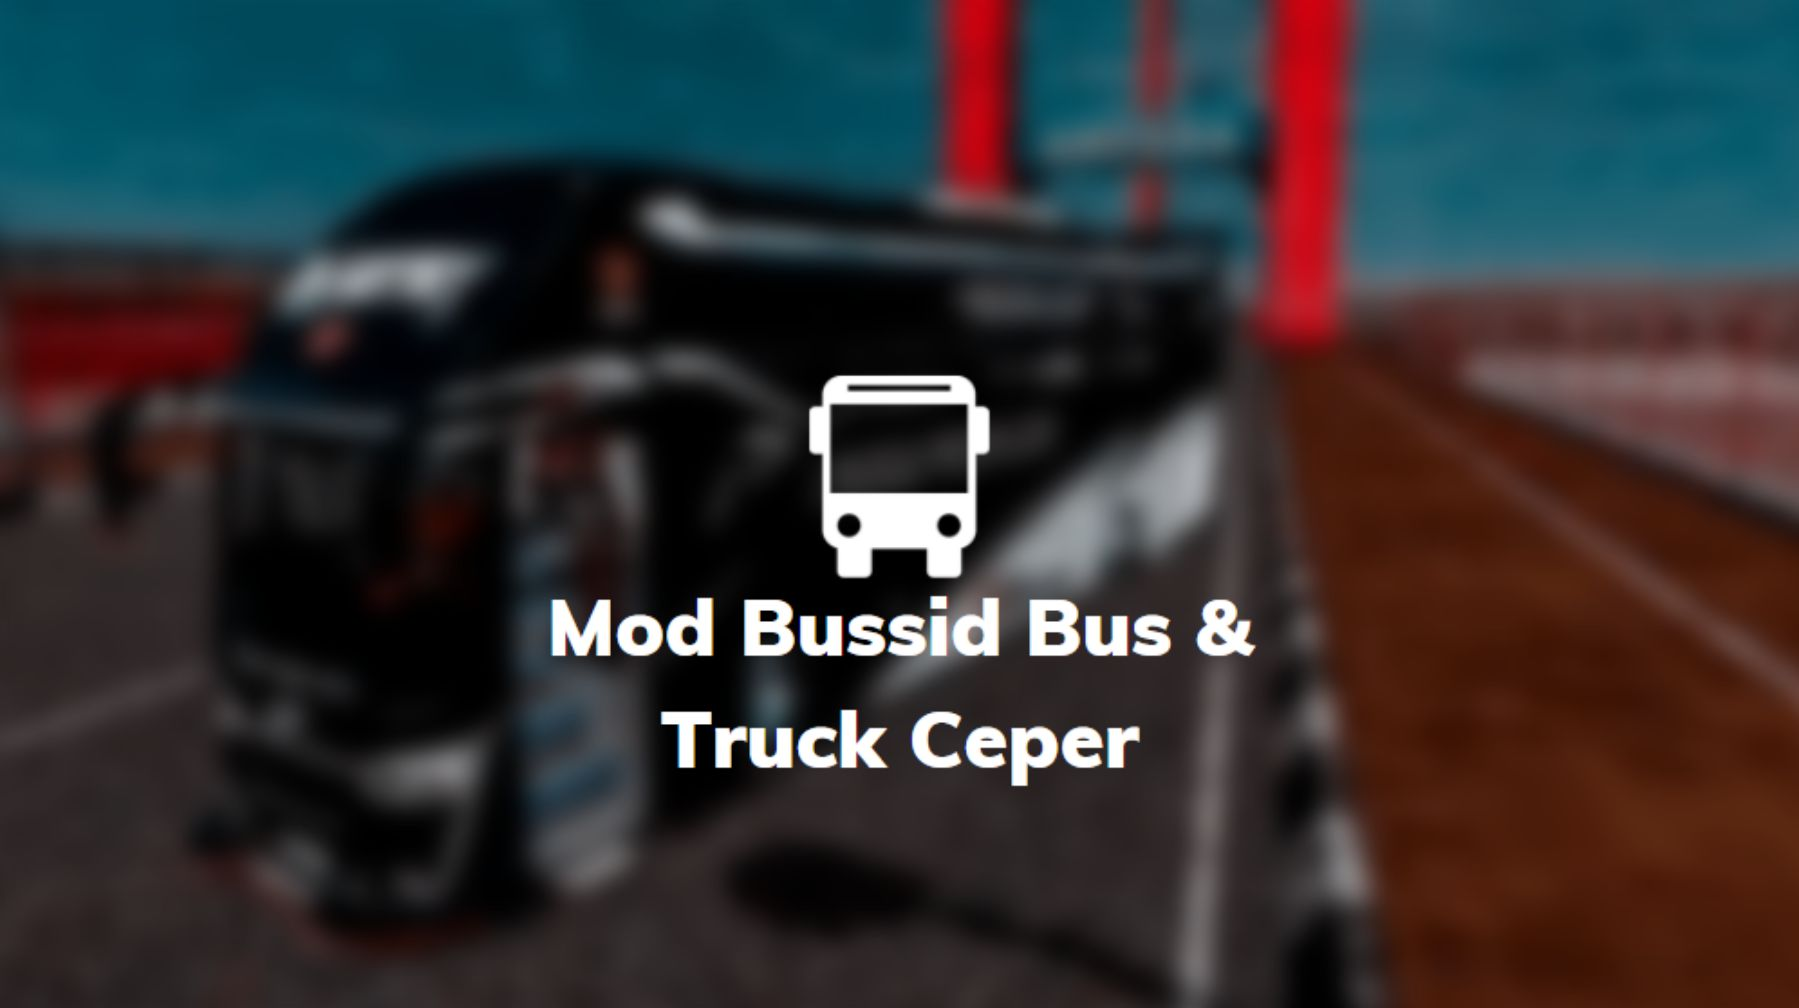 mod bussid truck bus ceper